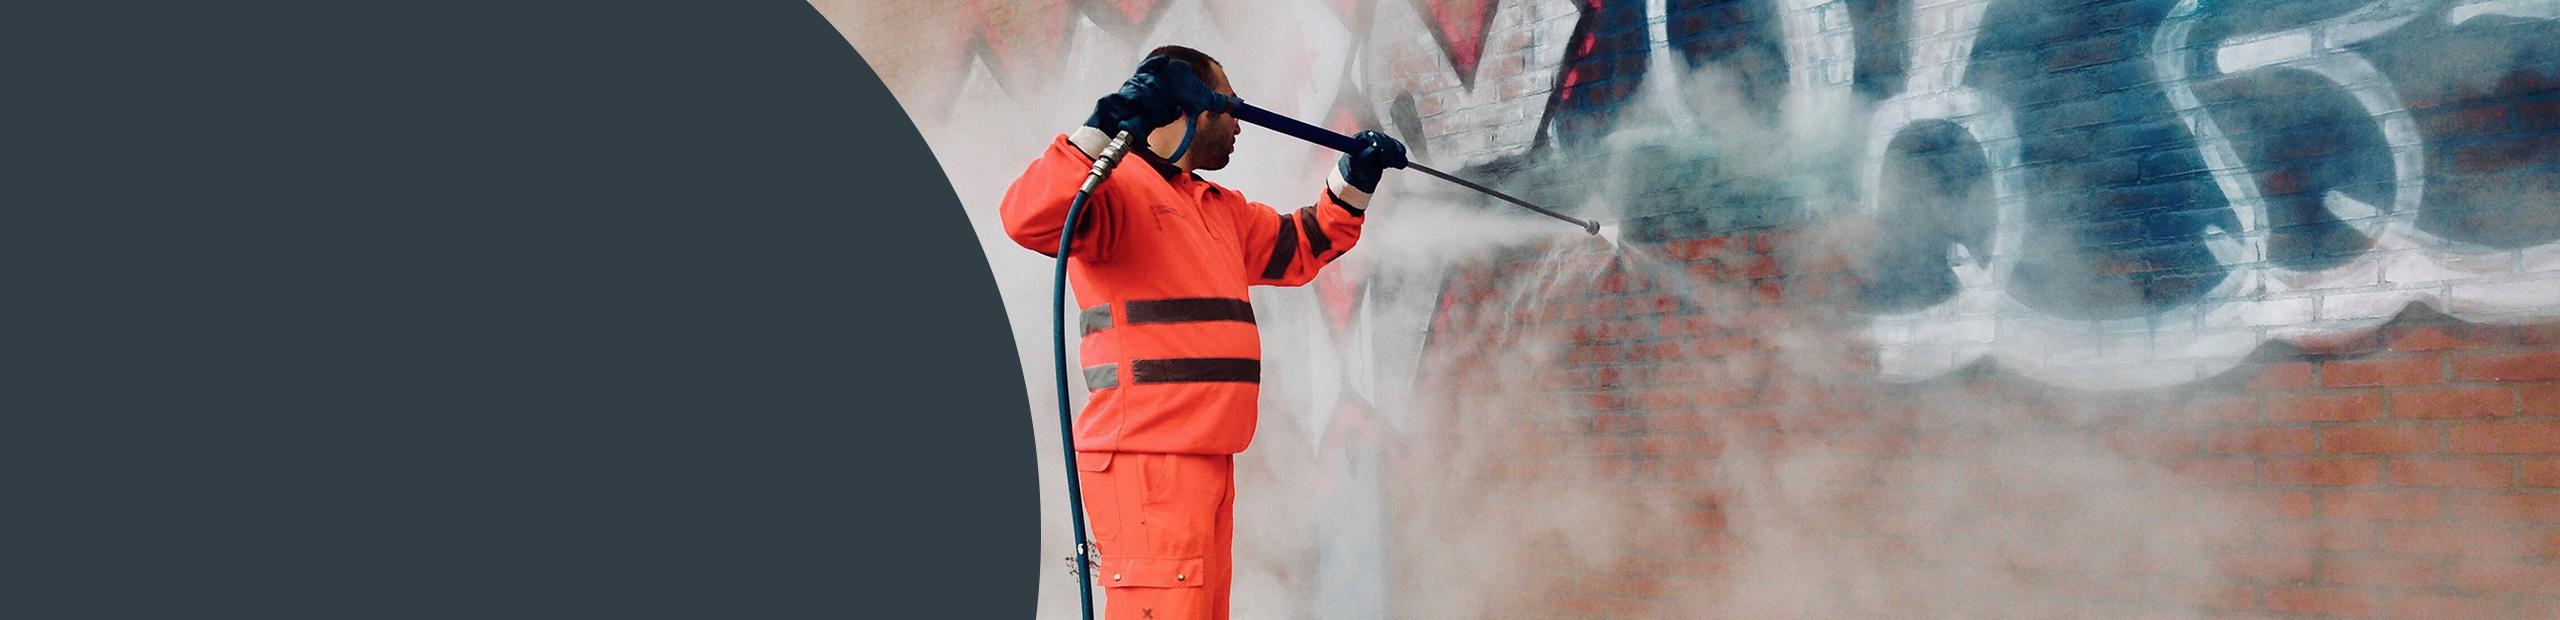 Industrial Cleaning Birmingham